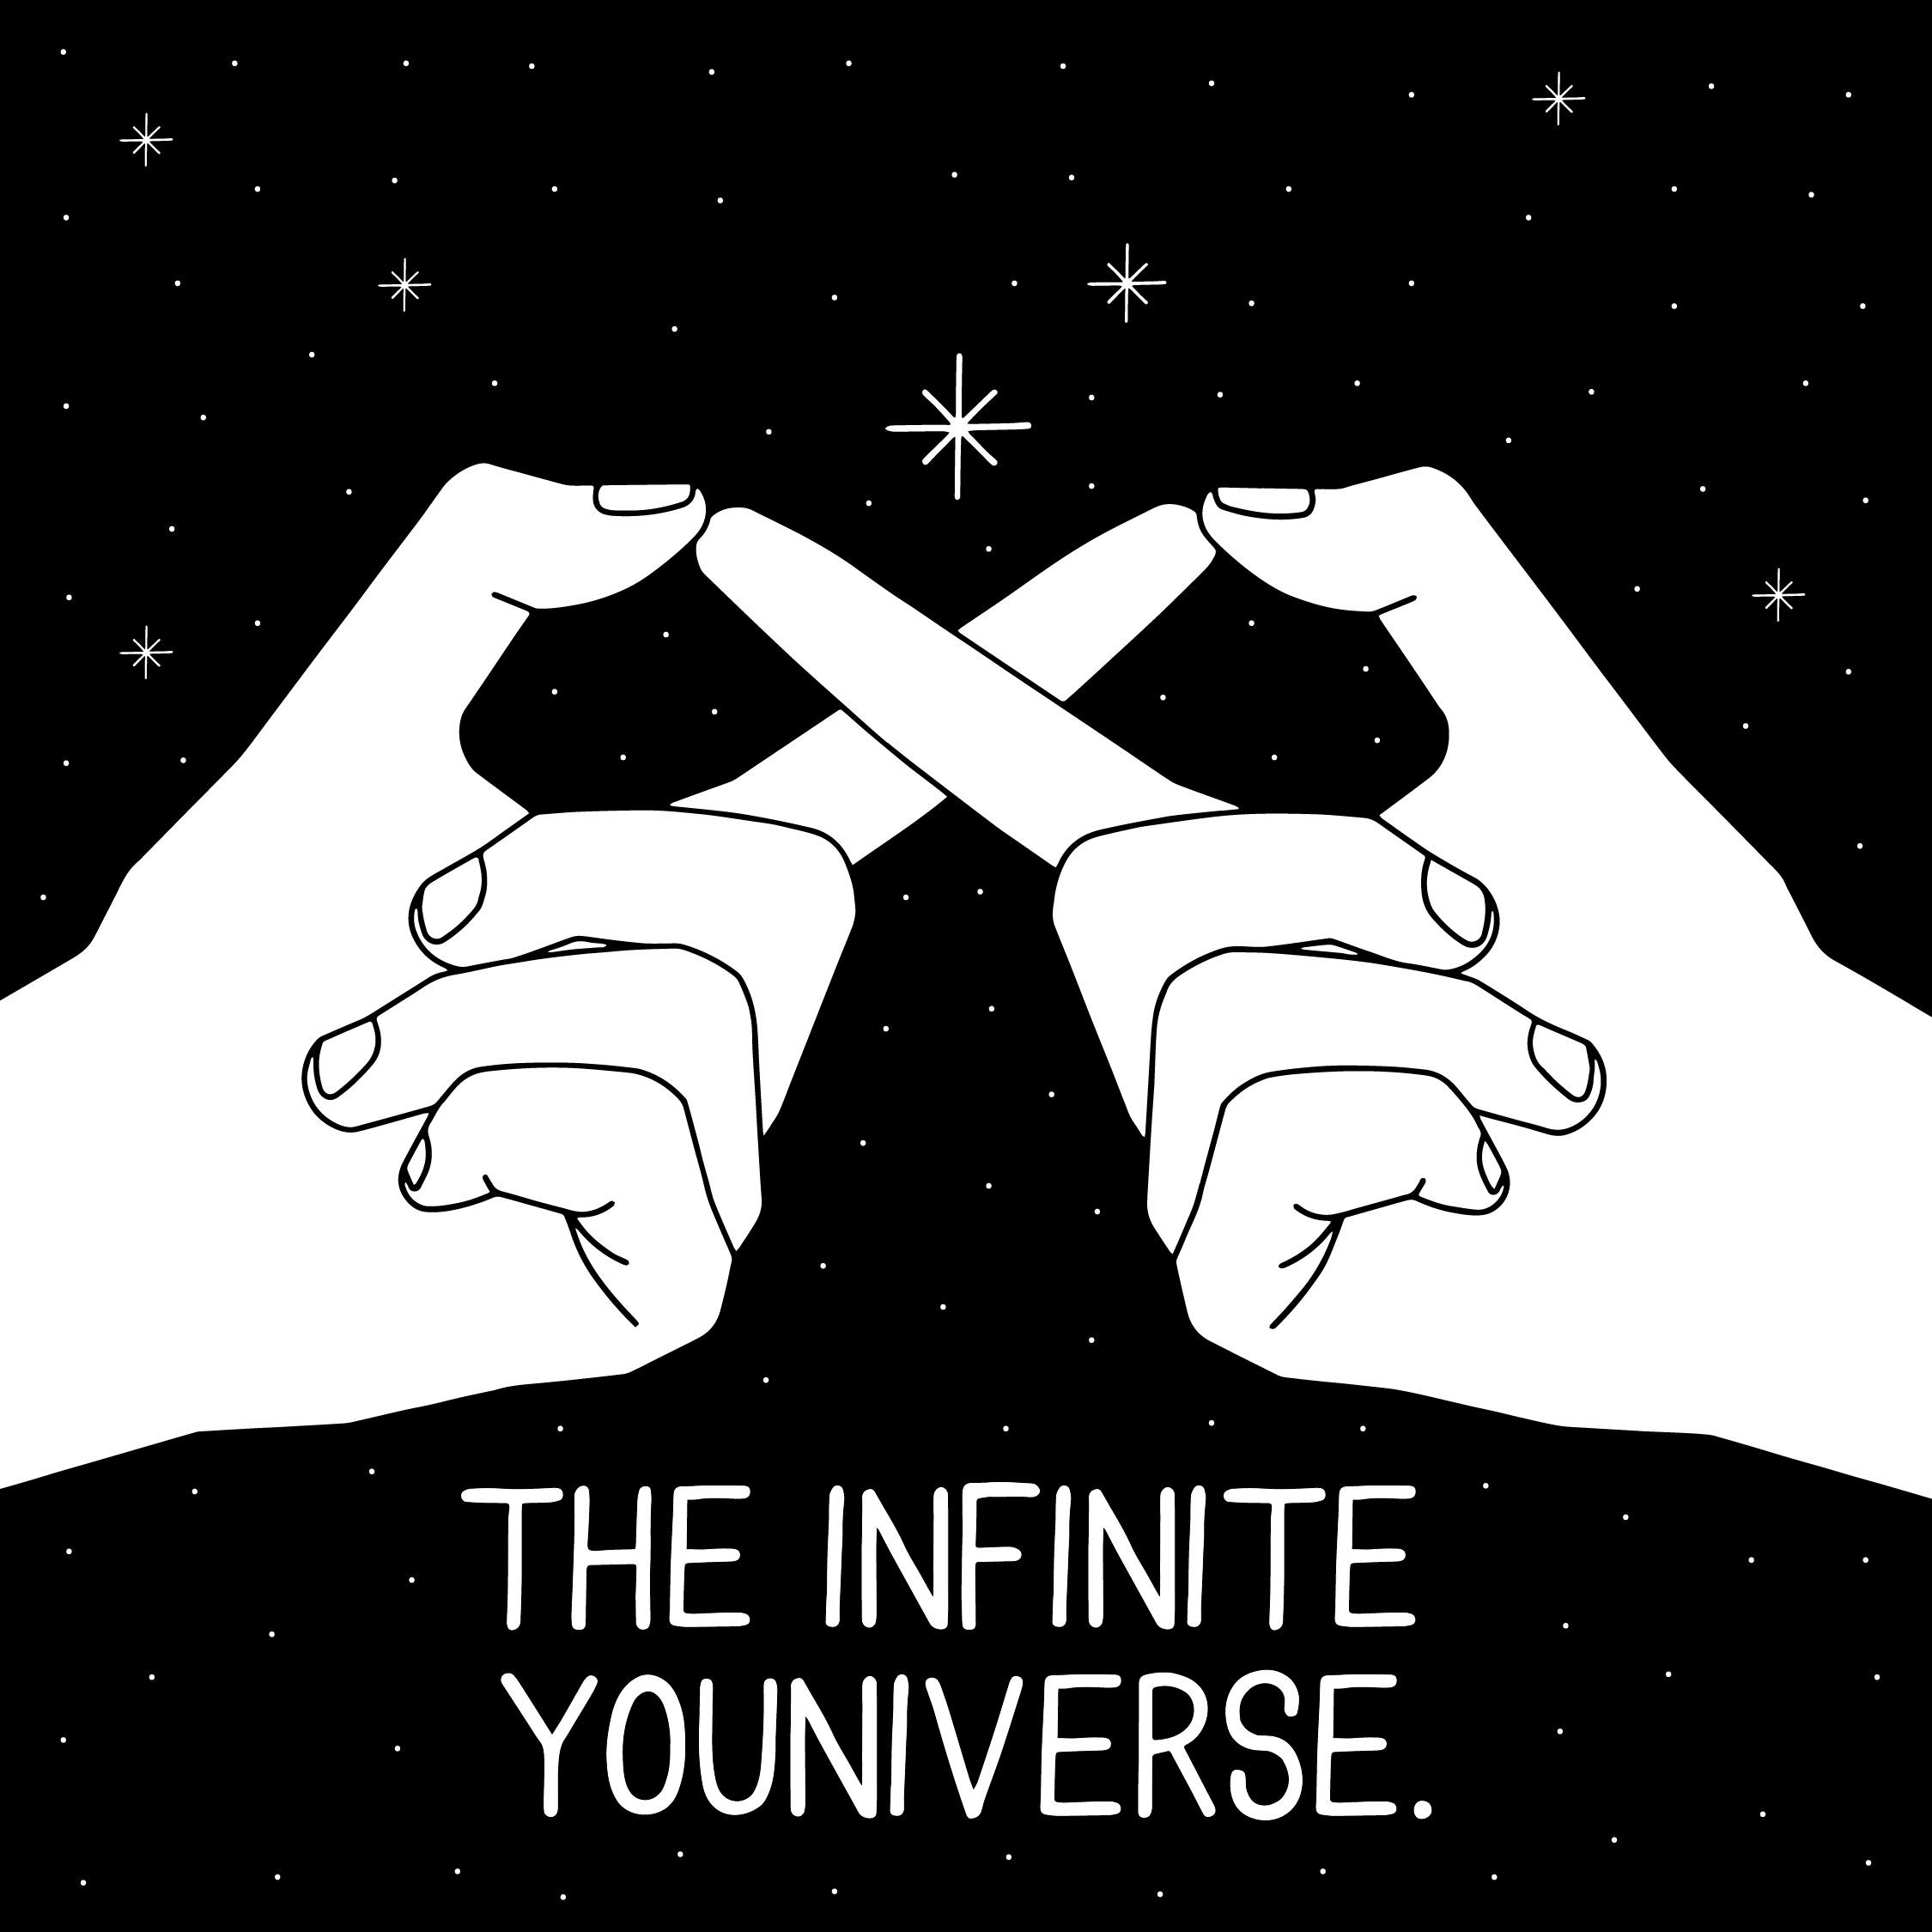 theinfiniteyouniverse-01.jpg